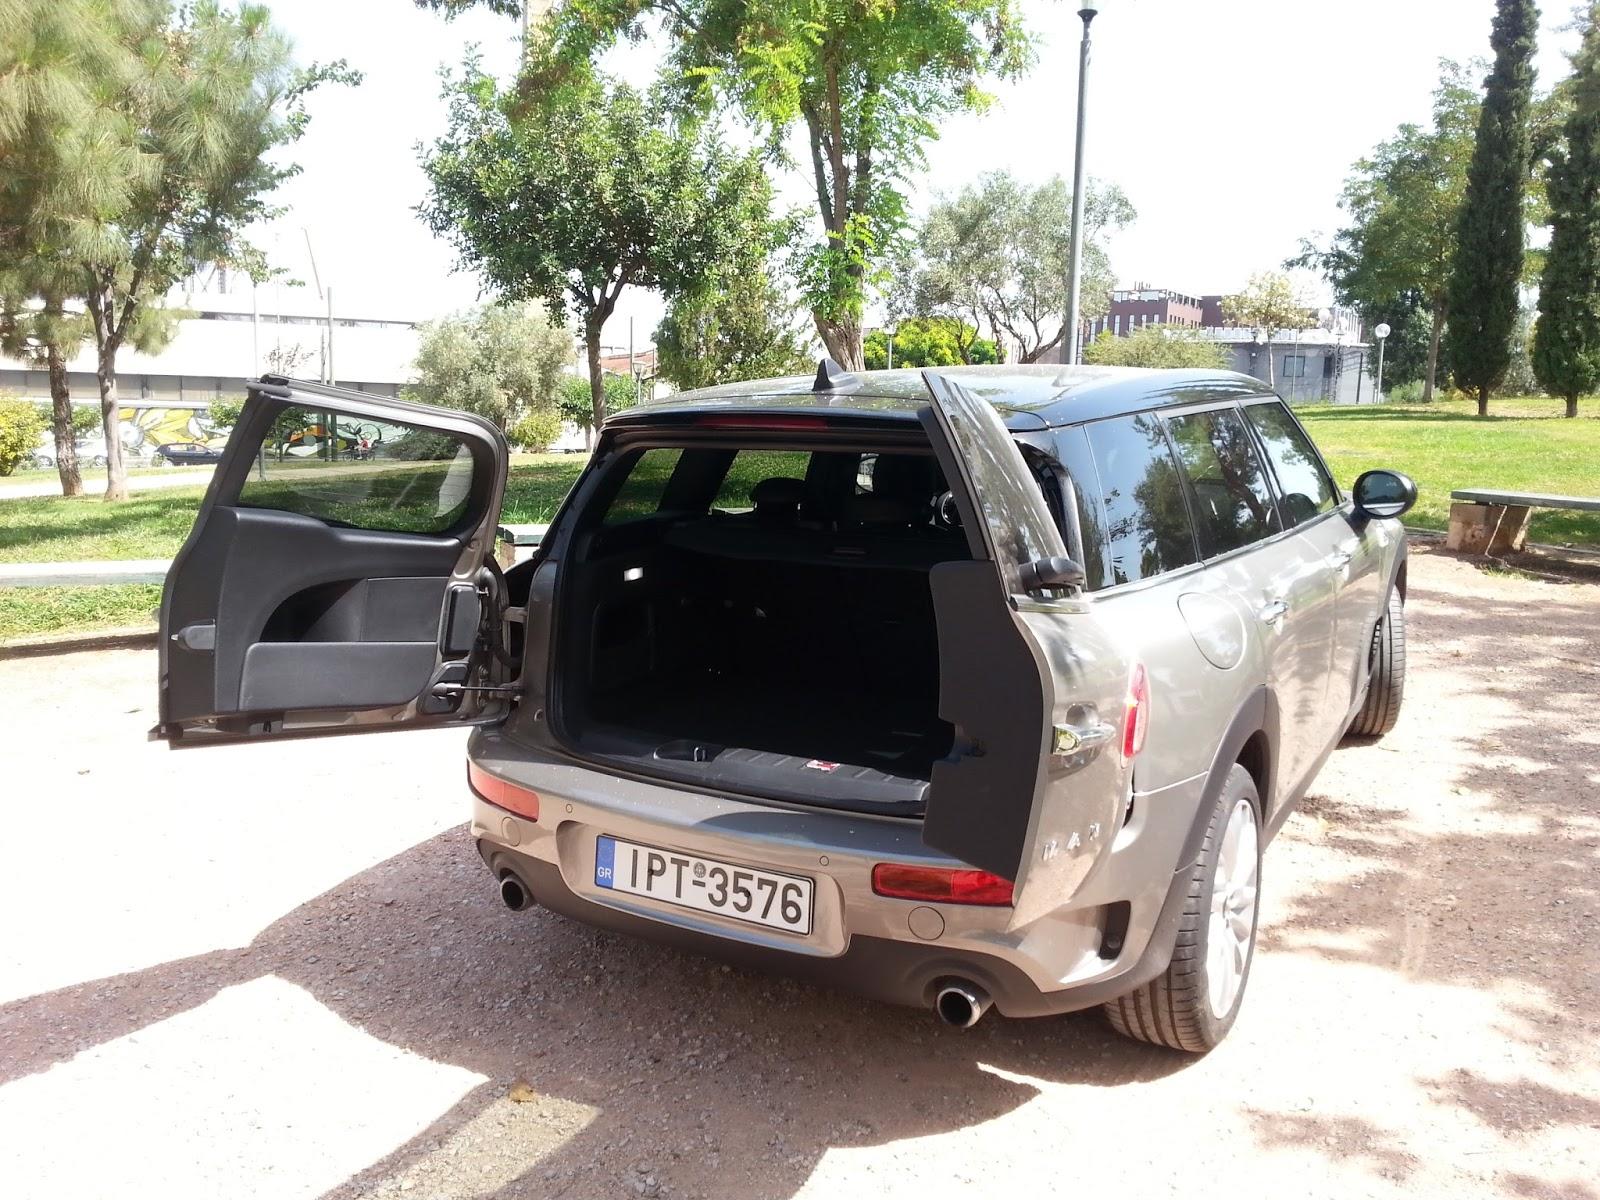 clubman2Bportes Οδηγούμε το Mini Cooper S Clubman TEST, ΔΟΚΙΜΕΣ